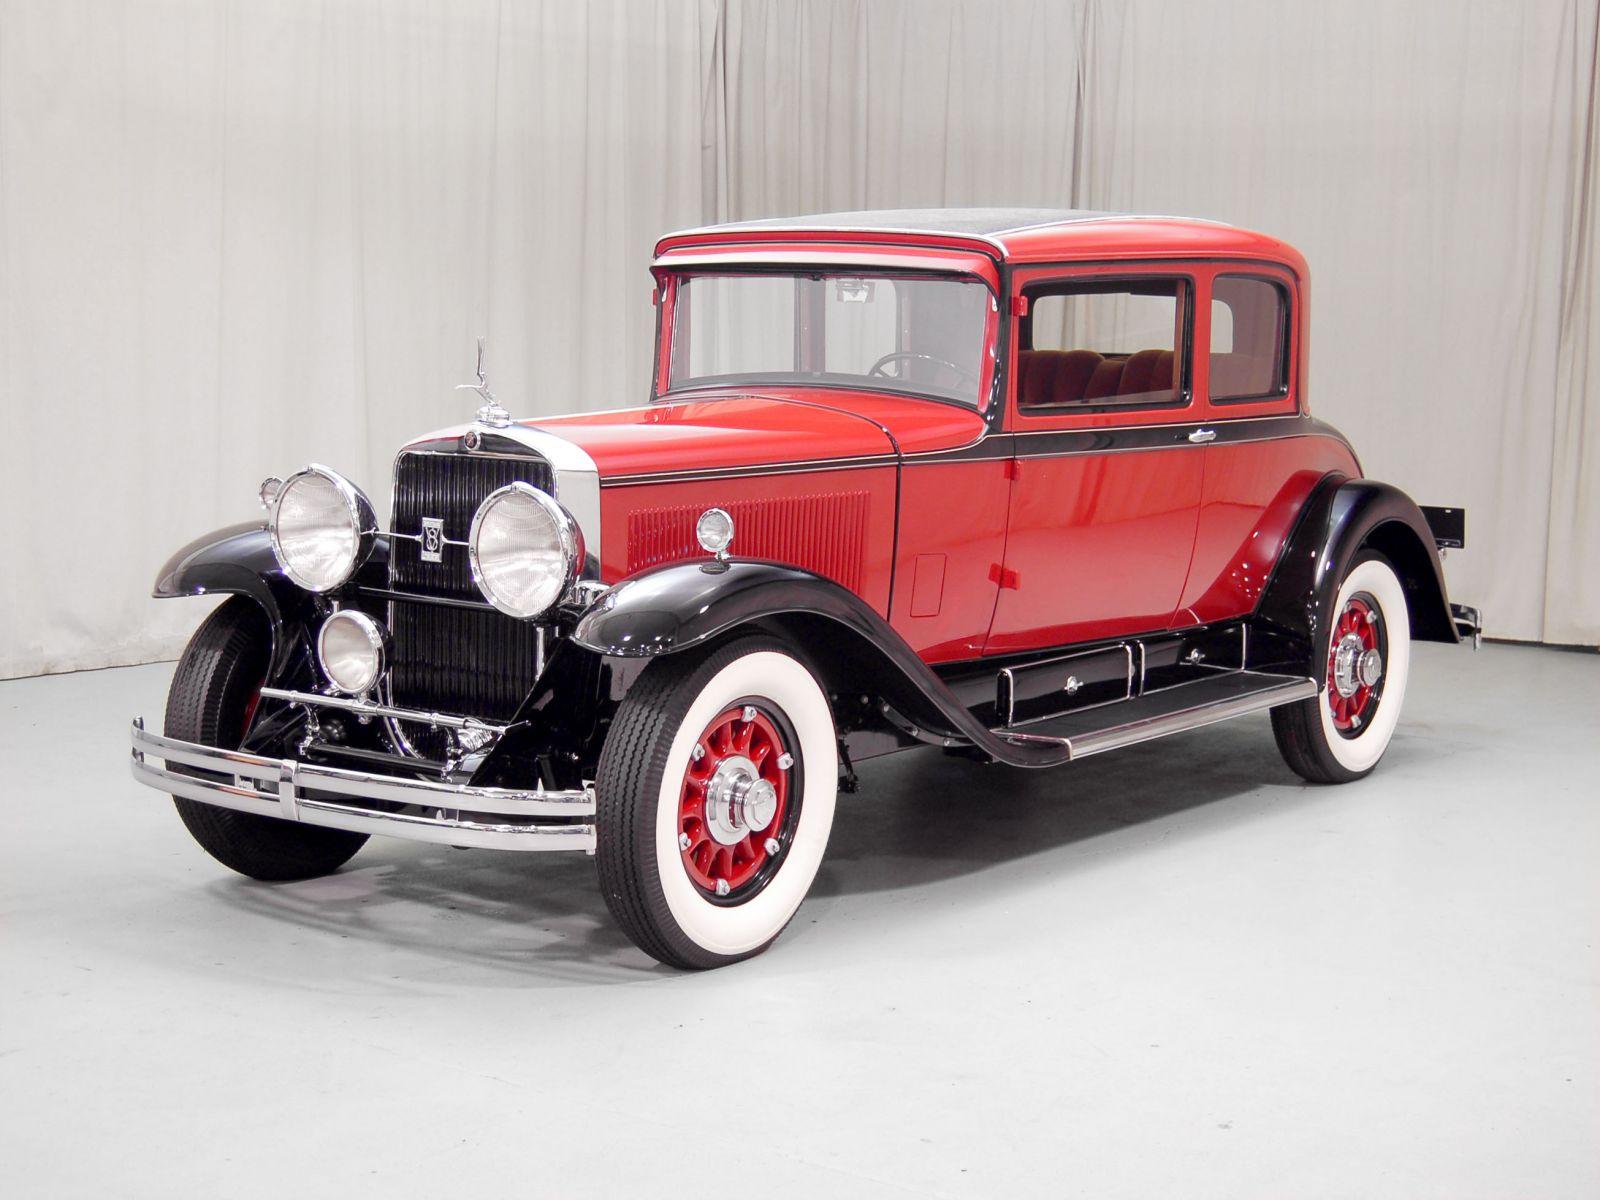 1930 Cadillac 353 Coupe | Hyman Ltd. Classic Cars